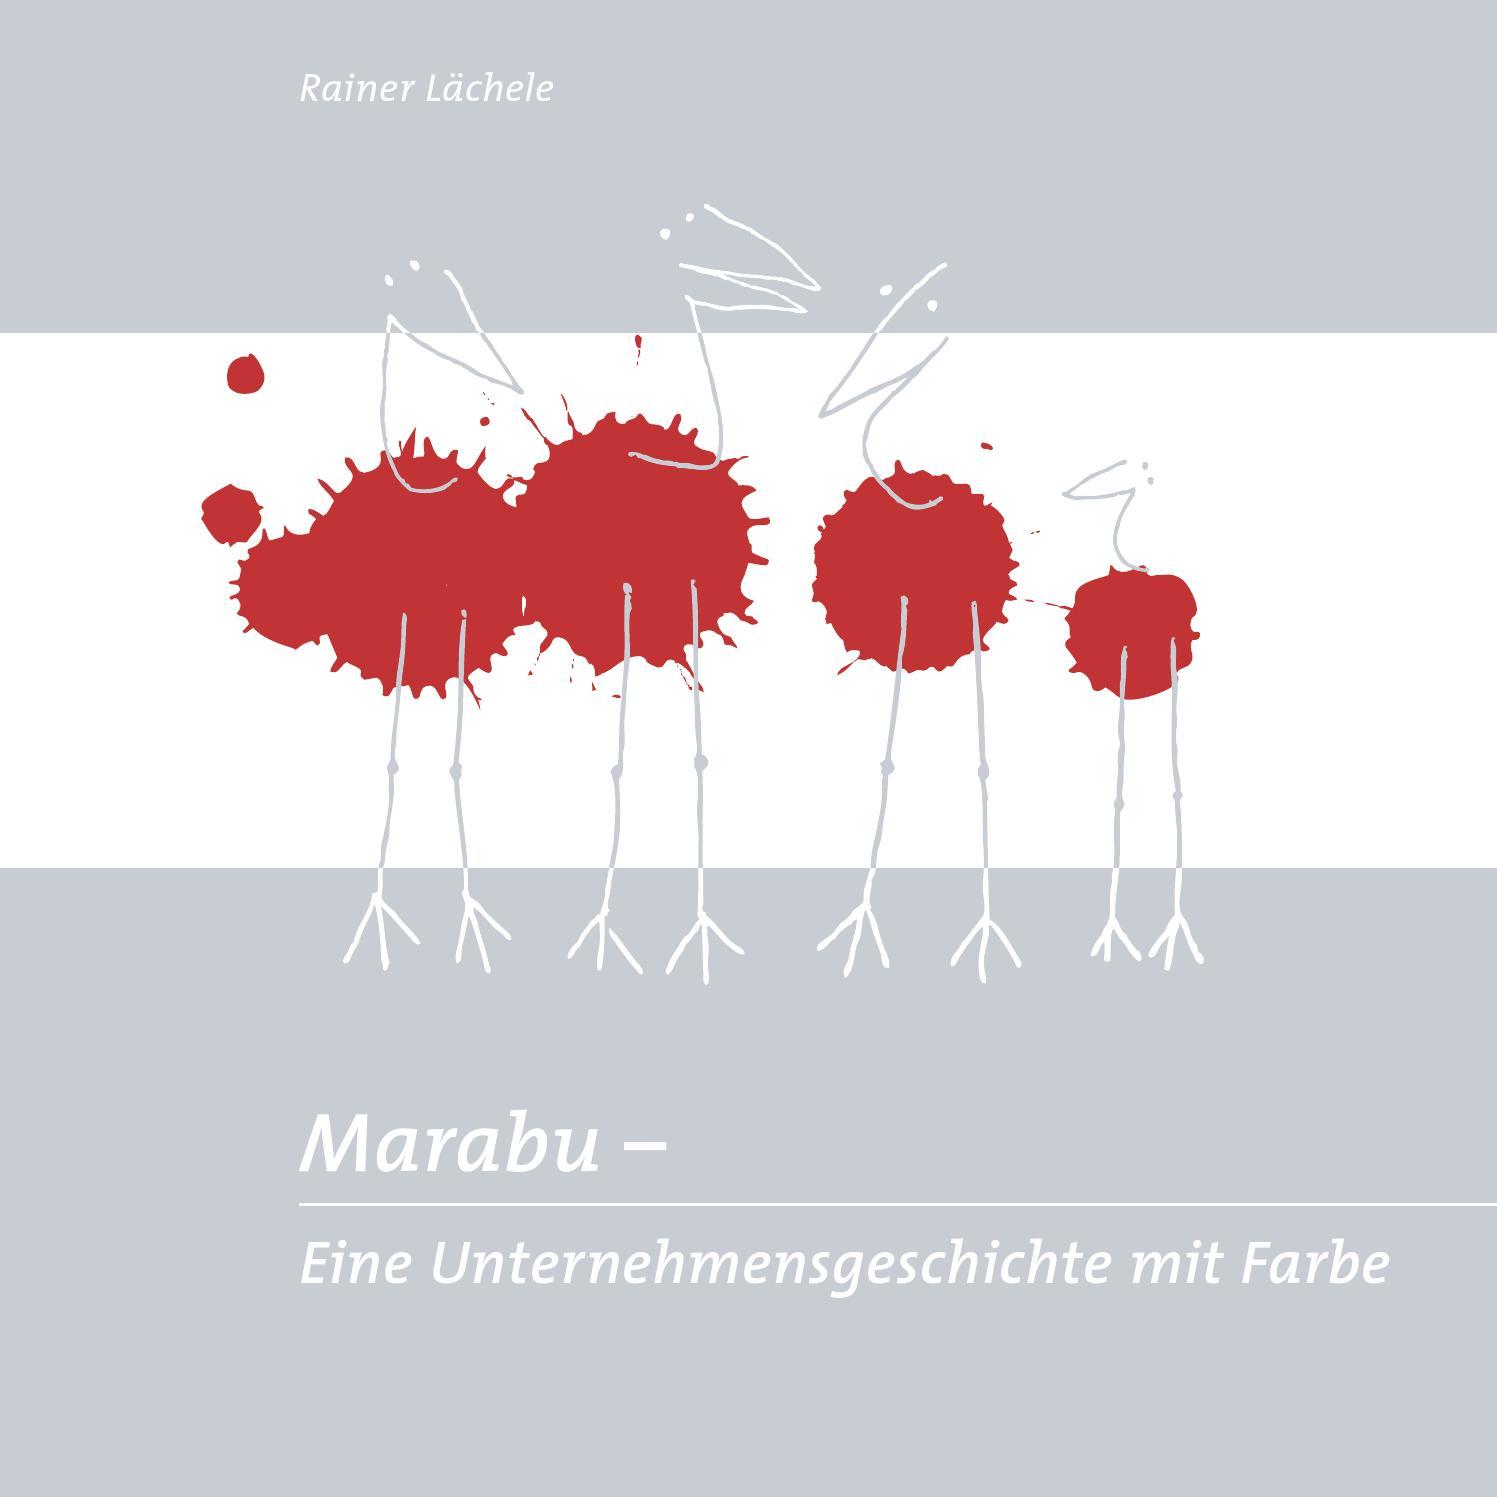 marabu chronik by marabu gmbh co kg issuu. Black Bedroom Furniture Sets. Home Design Ideas